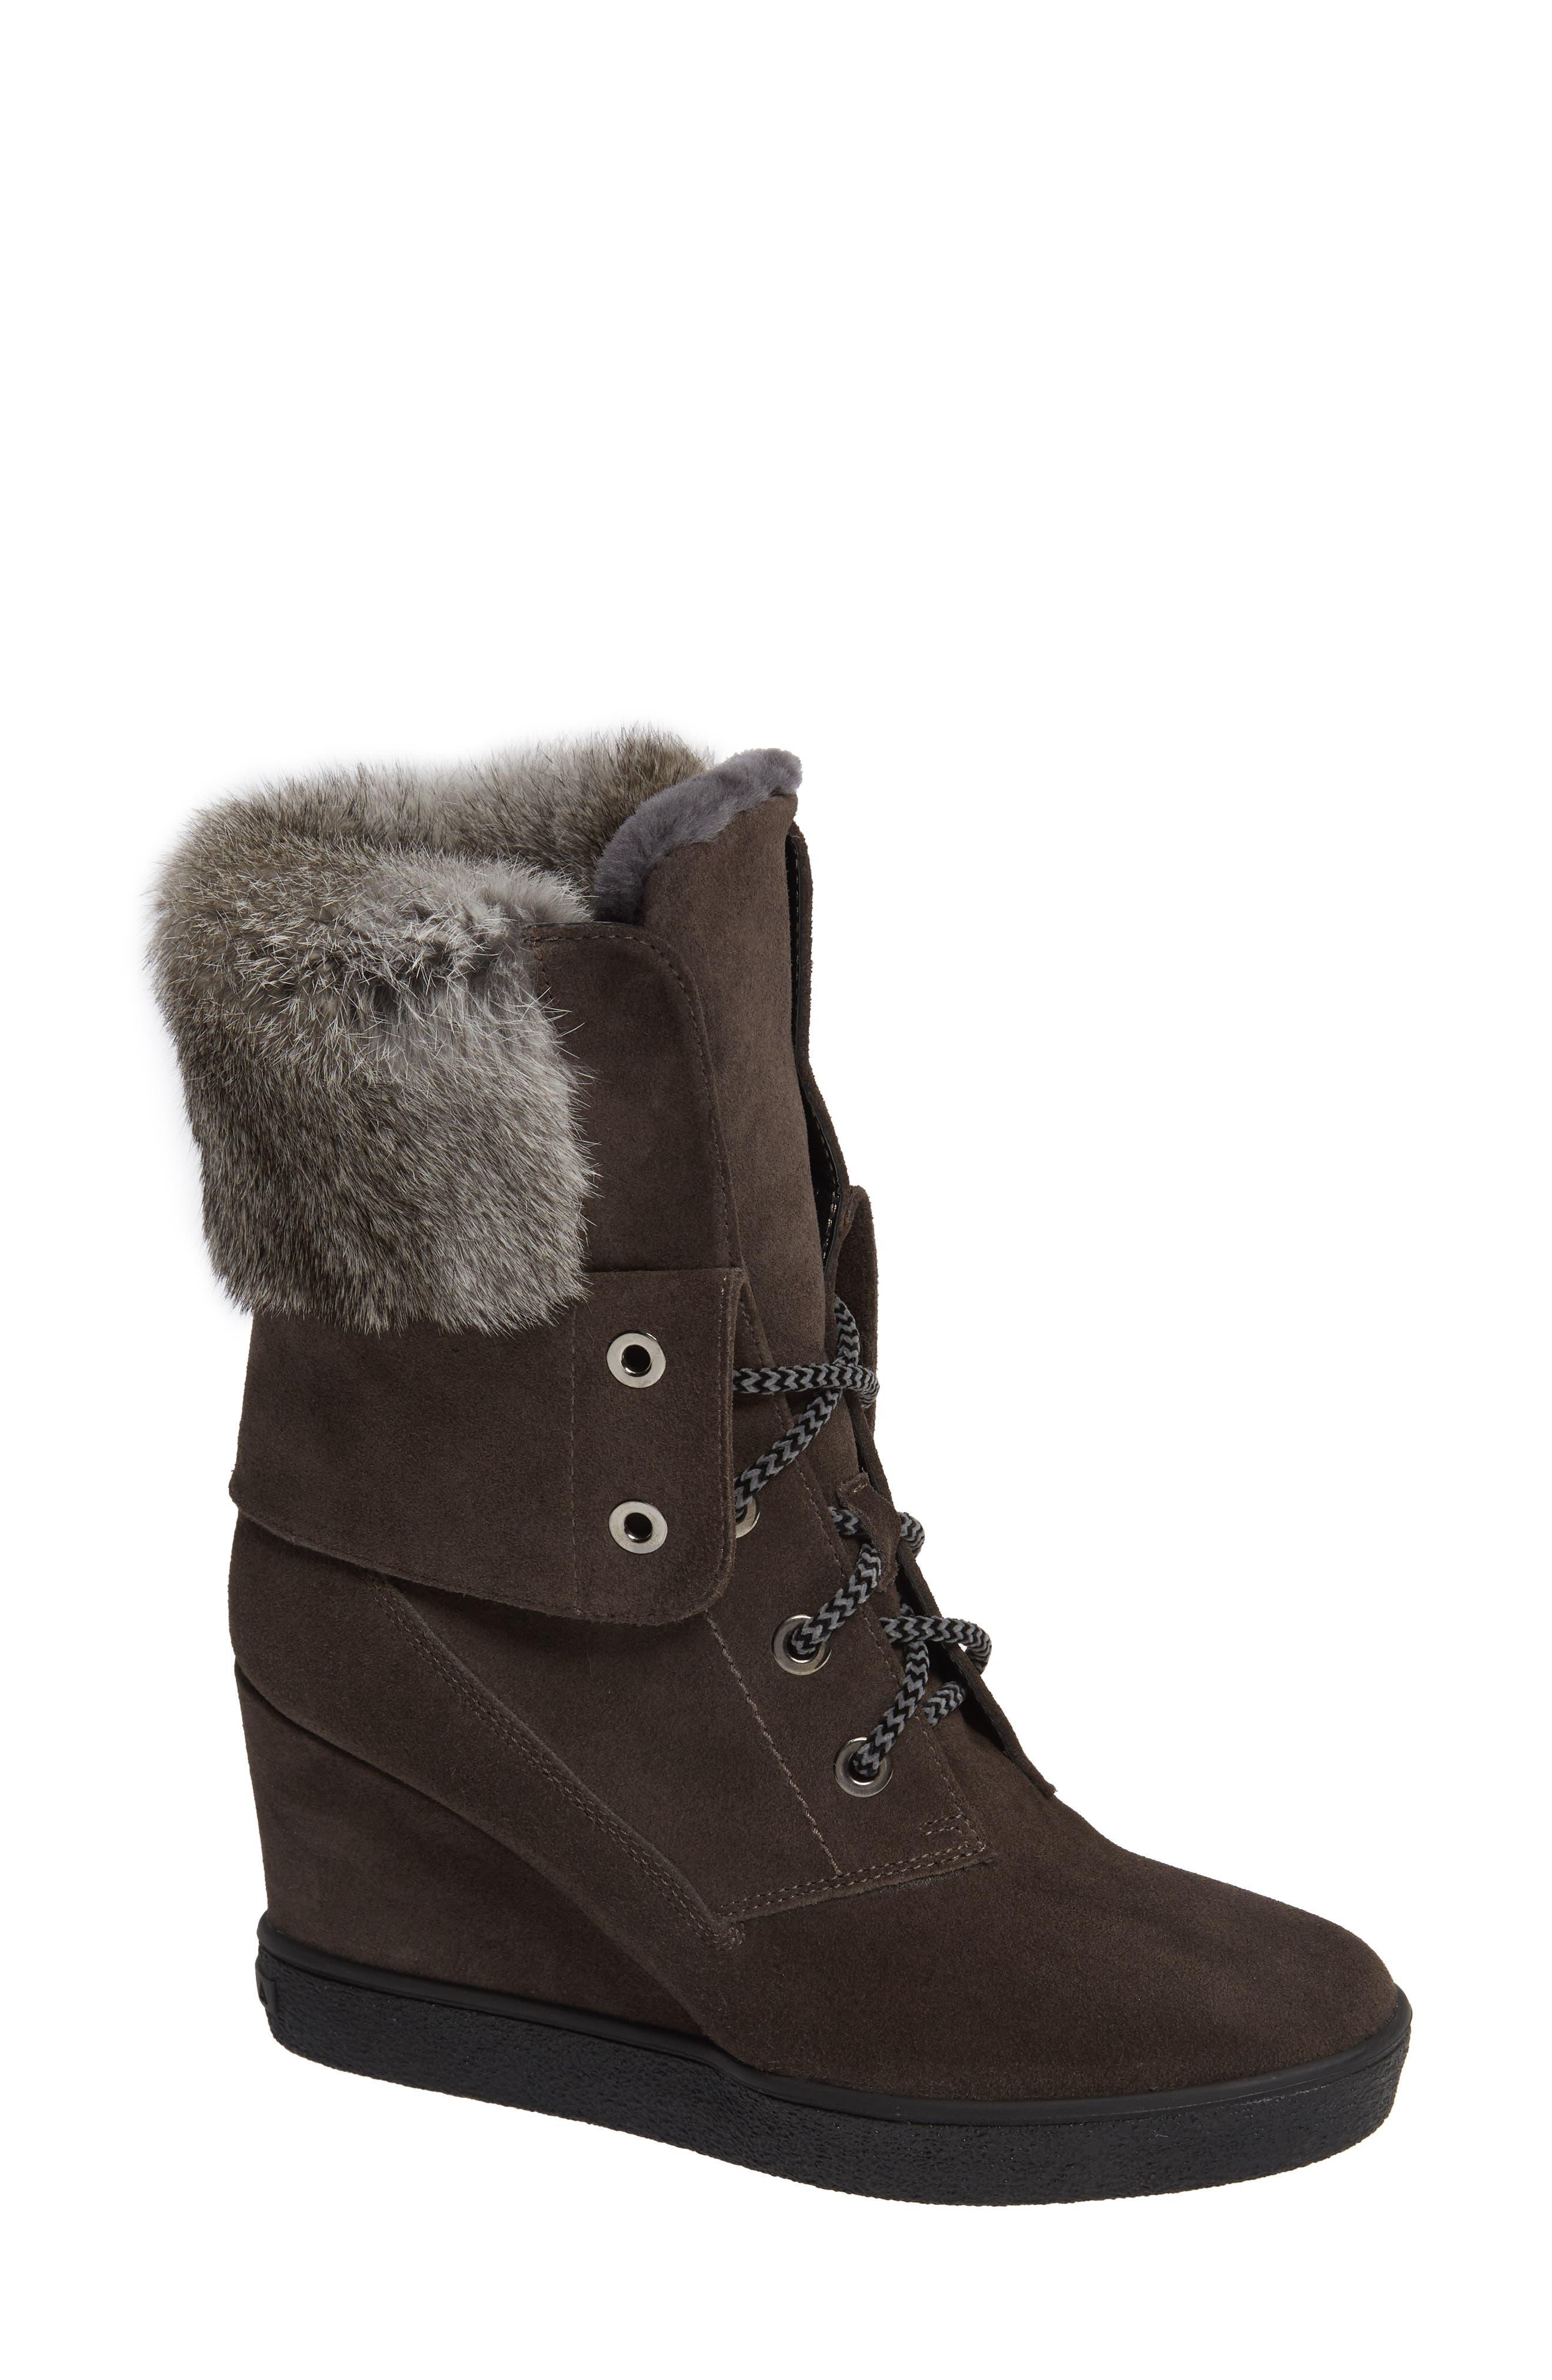 Aquatalia Cordelia Water Resistant Genuine Rabbit Fur Boot, Grey